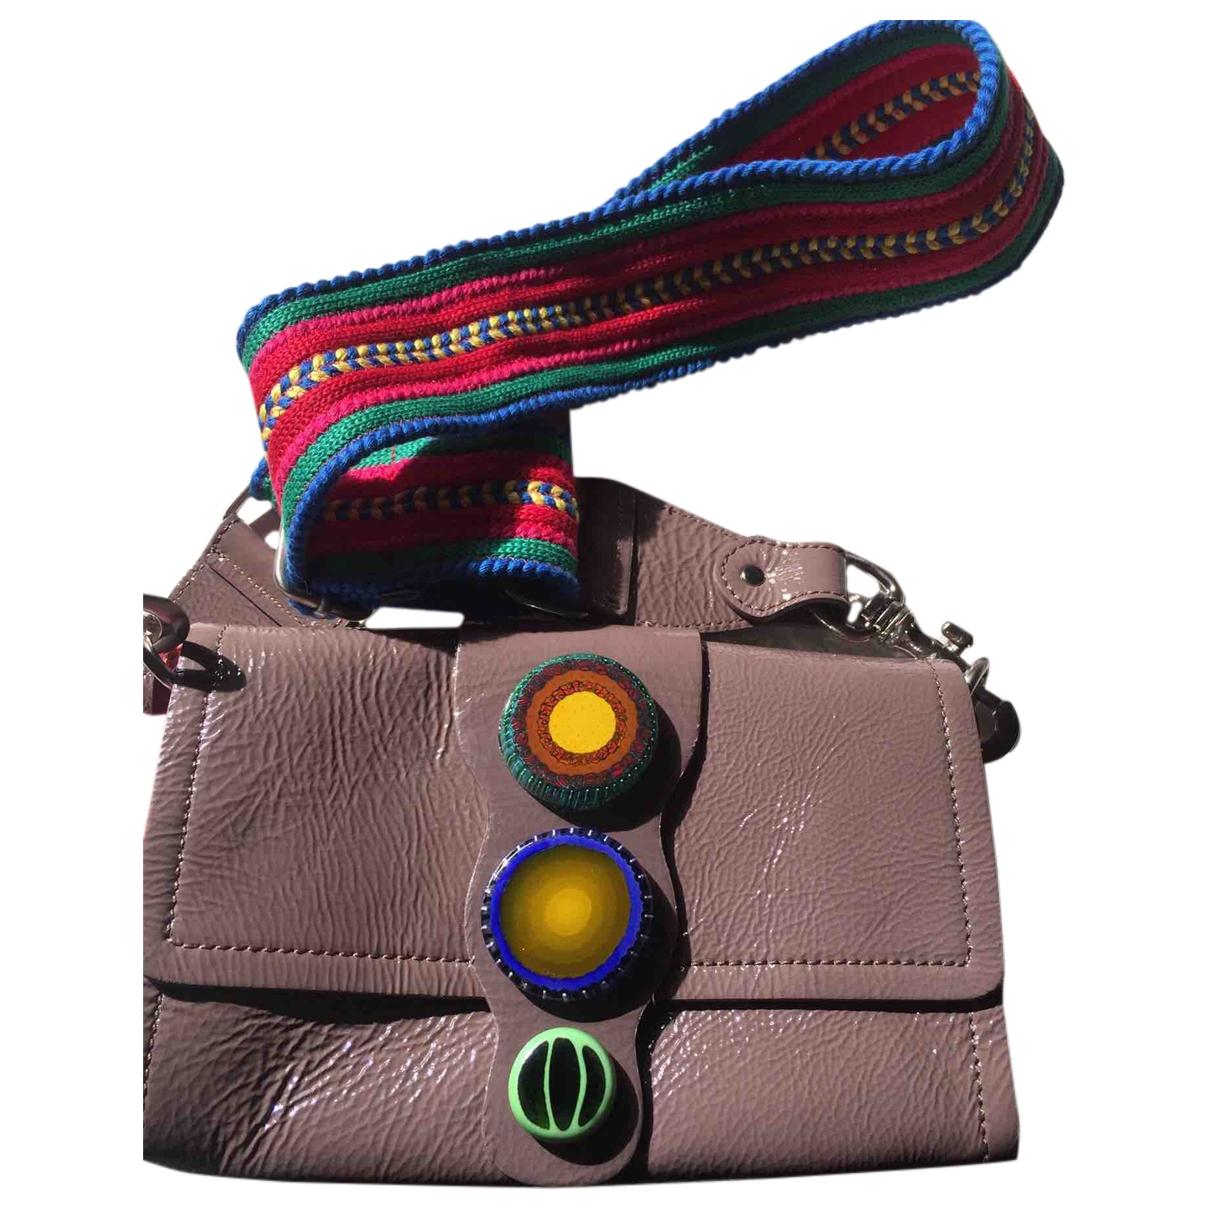 Maliparmi \N Multicolour Patent leather handbag for Women \N